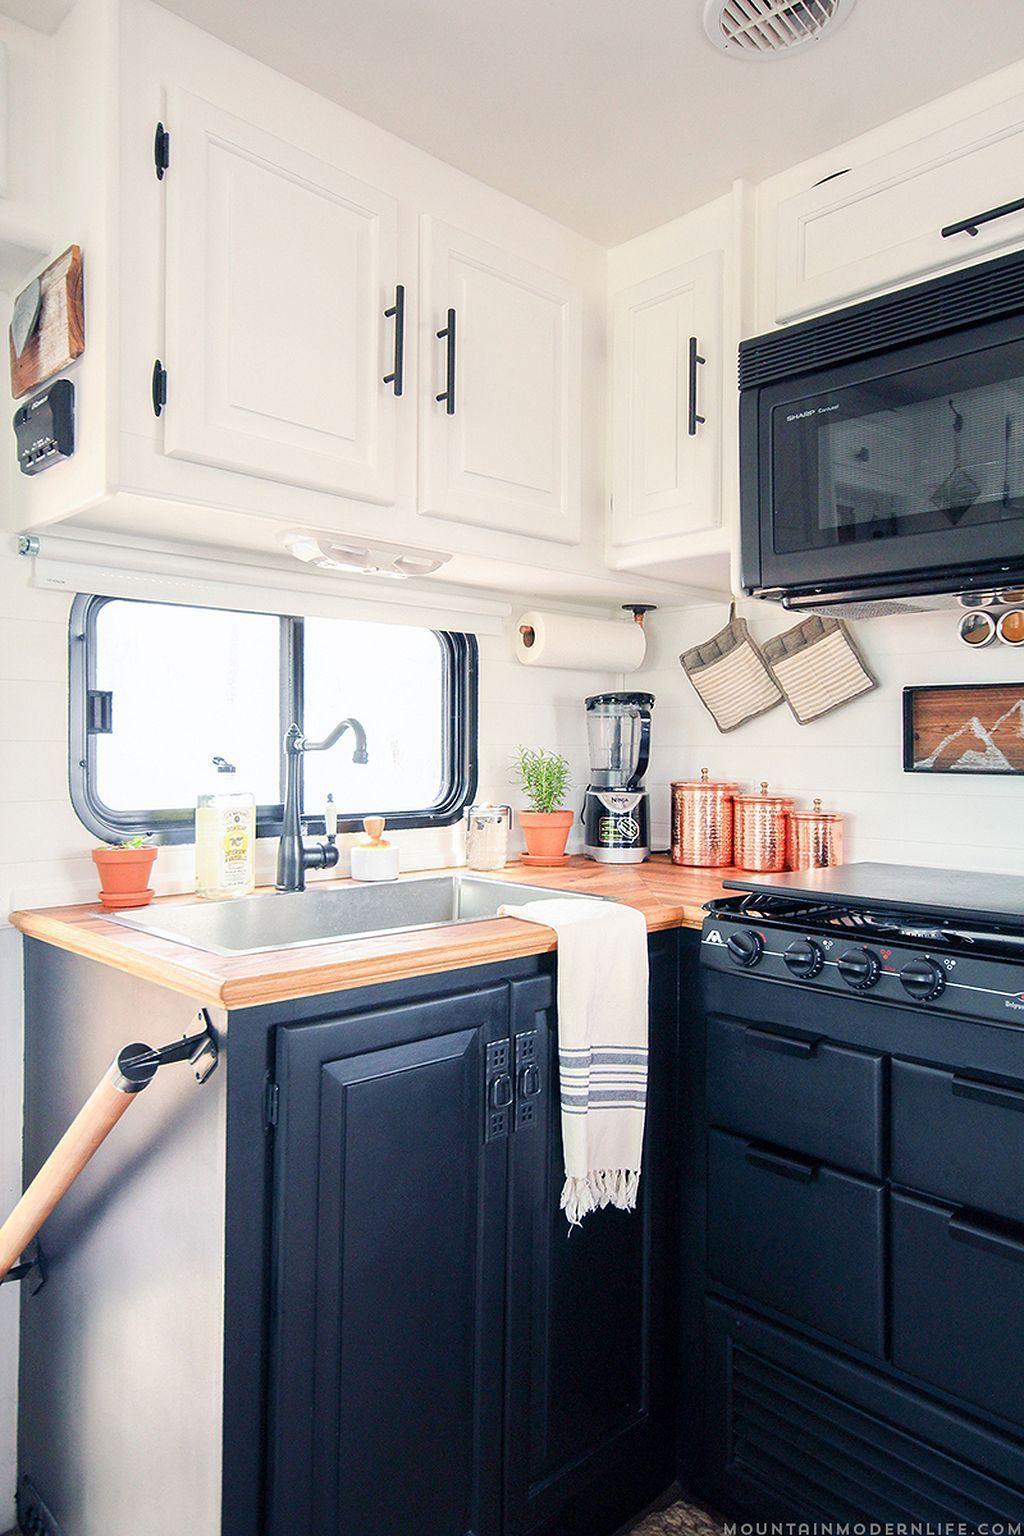 Modern Interior Ideas For RV Camper 37 | Pinterest | Rv campers ...